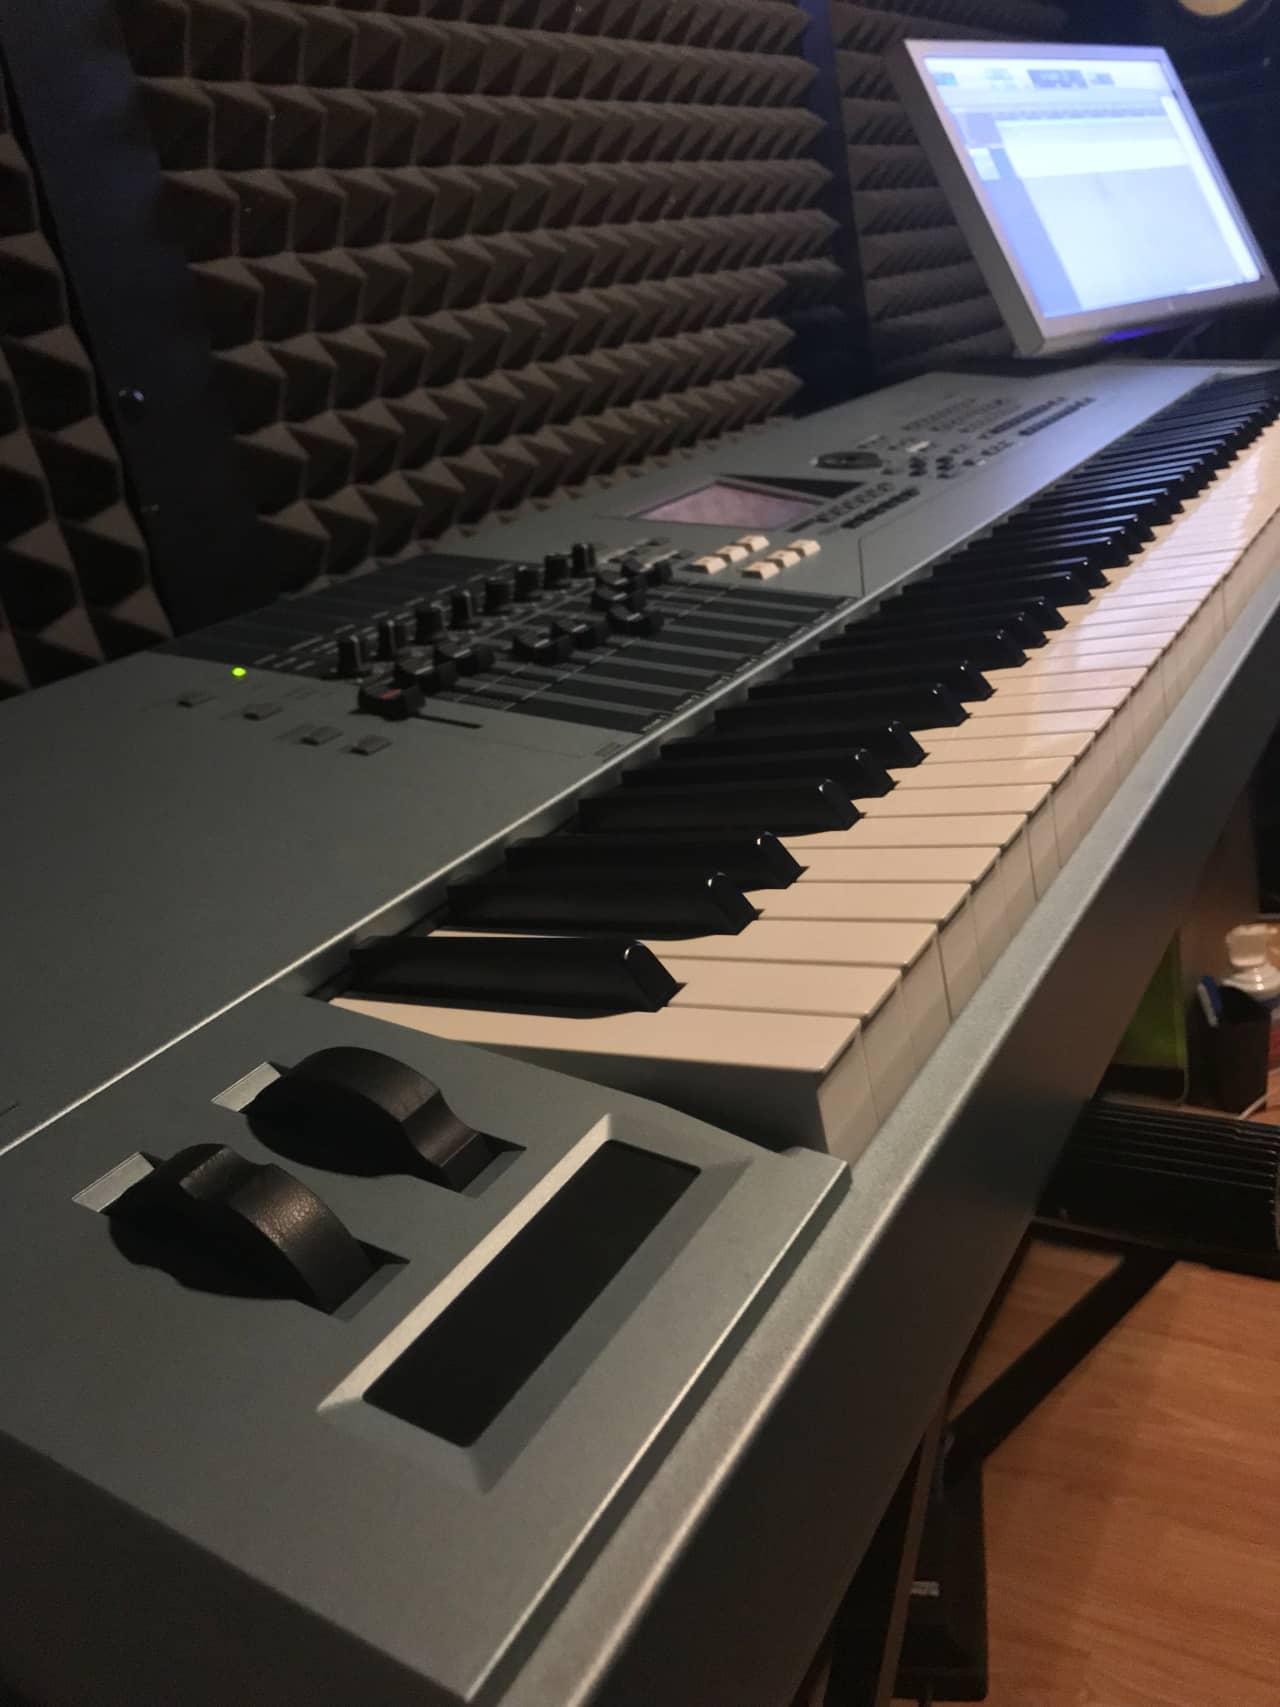 Yamaha motif xs8 mystromatthews music reverb for Yamaha motif xs8 specs